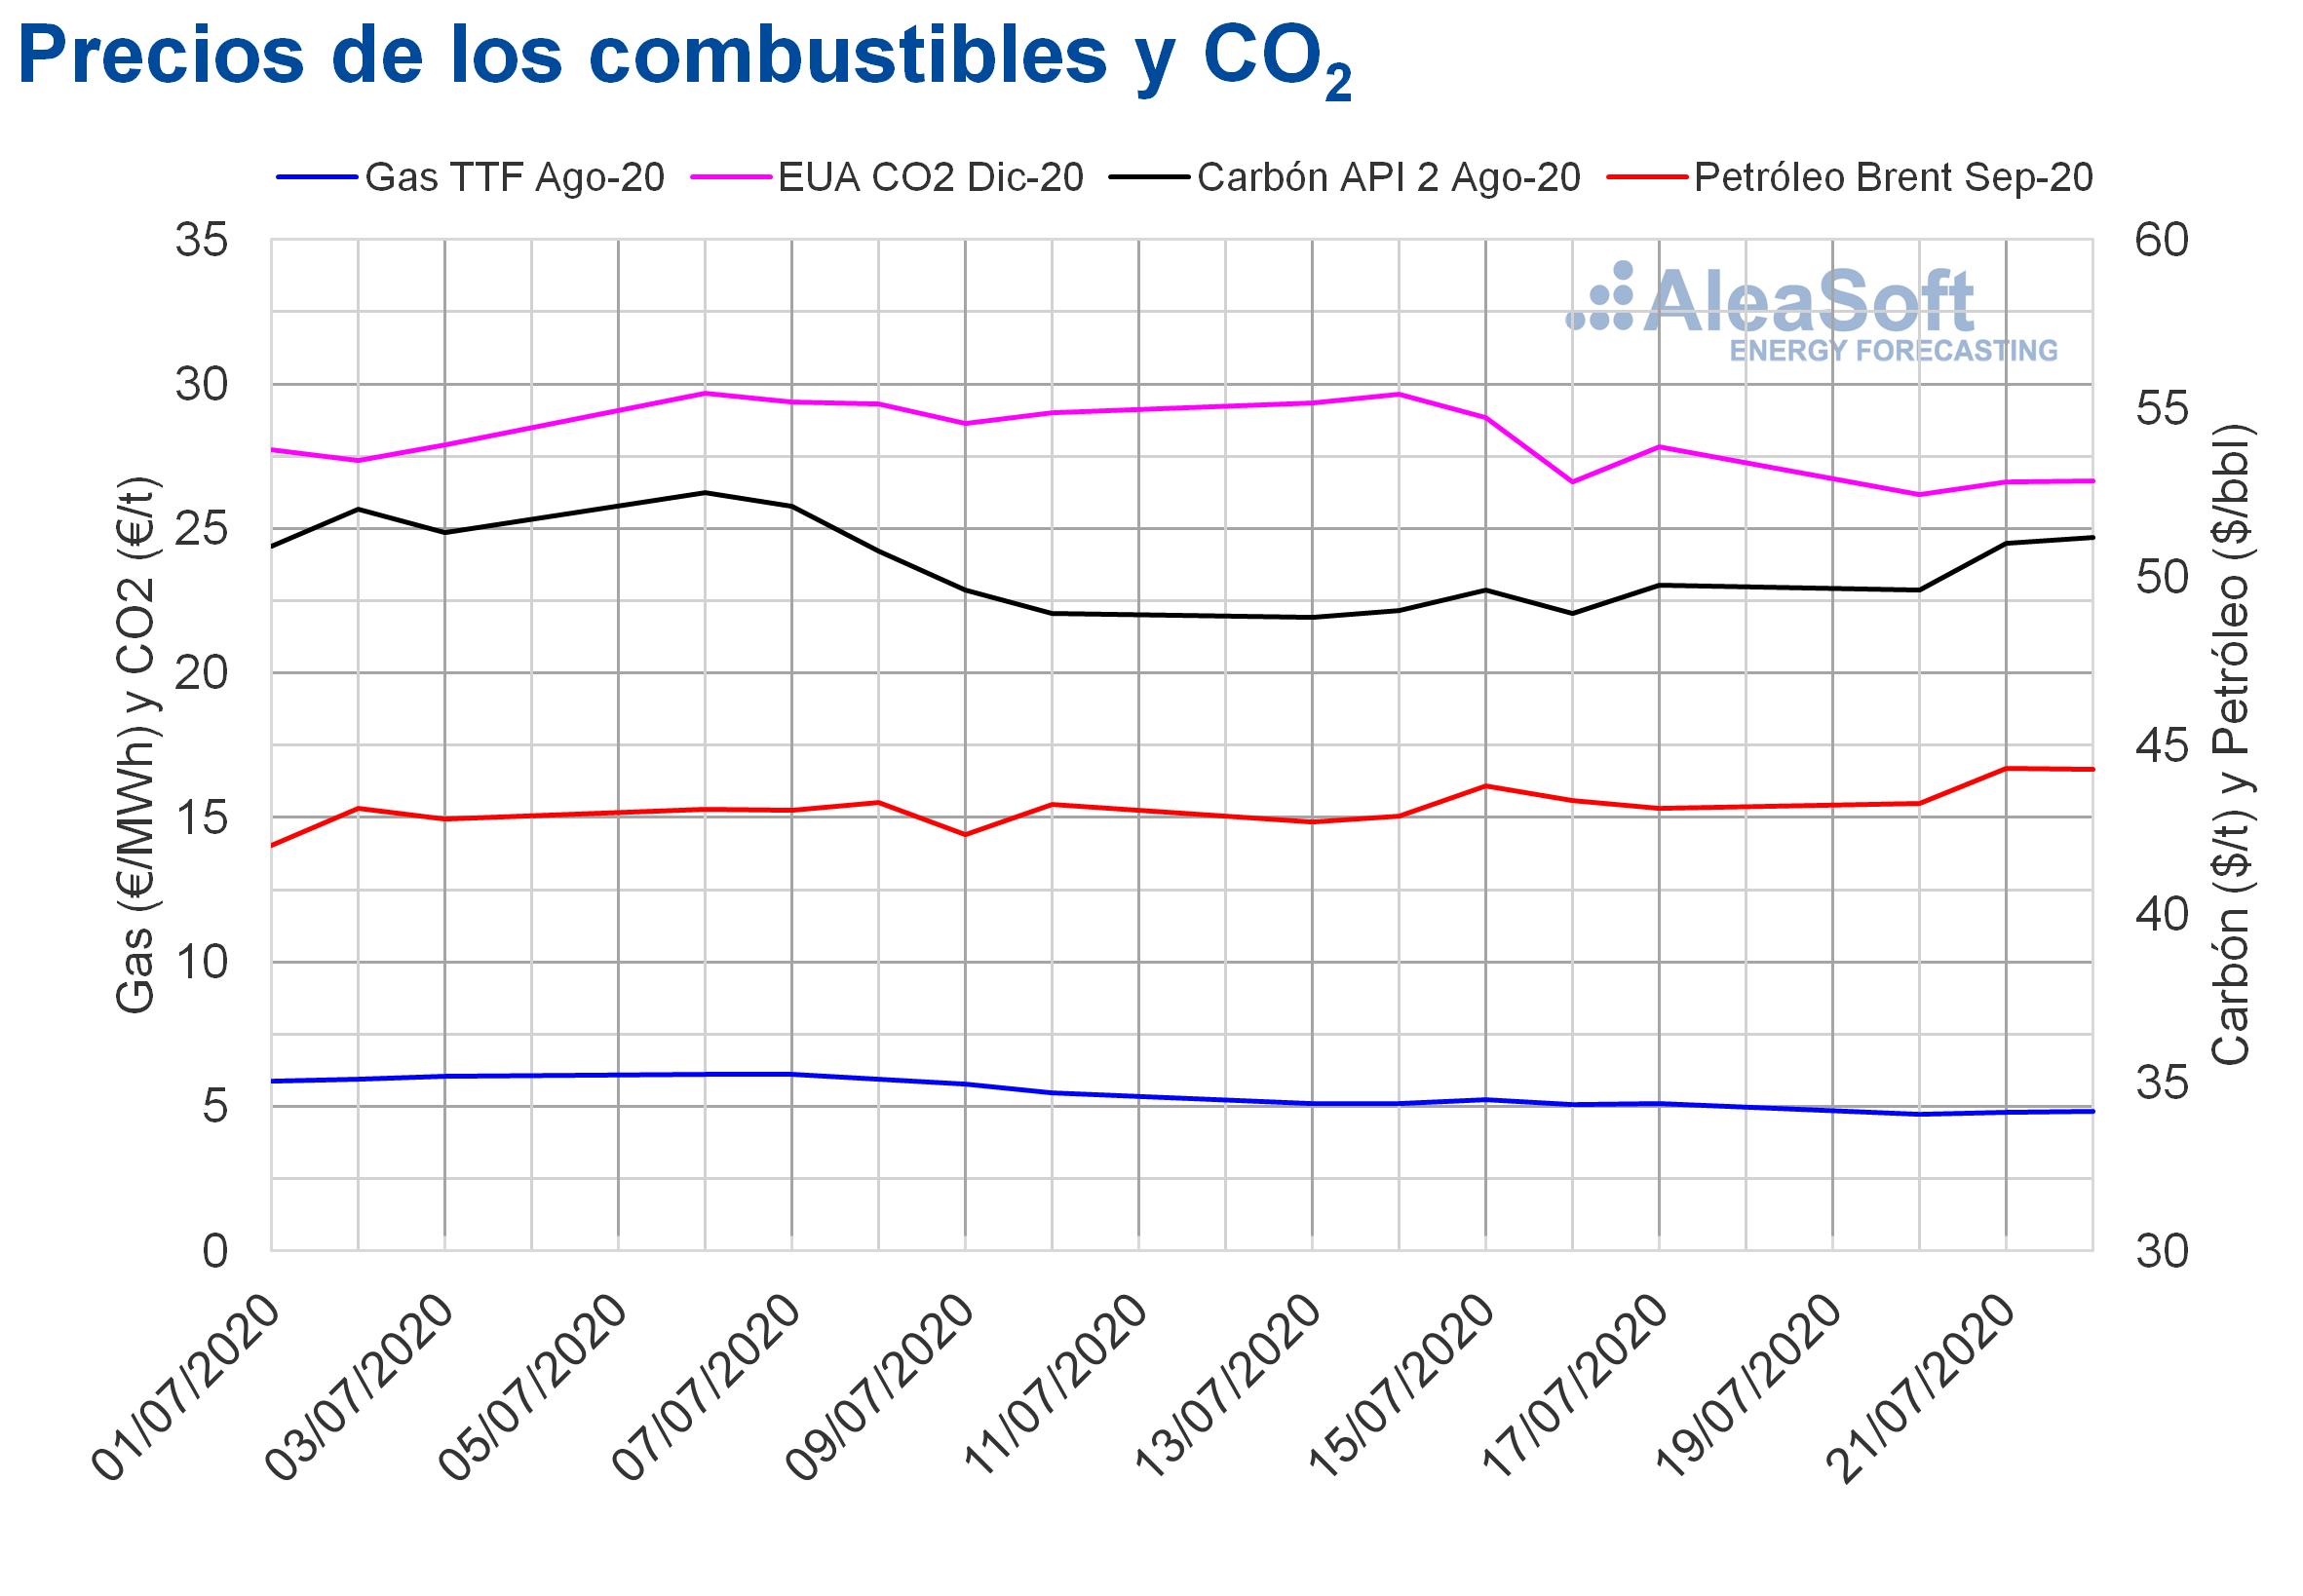 AleaSoft - Precios gas carbon Brent CO2